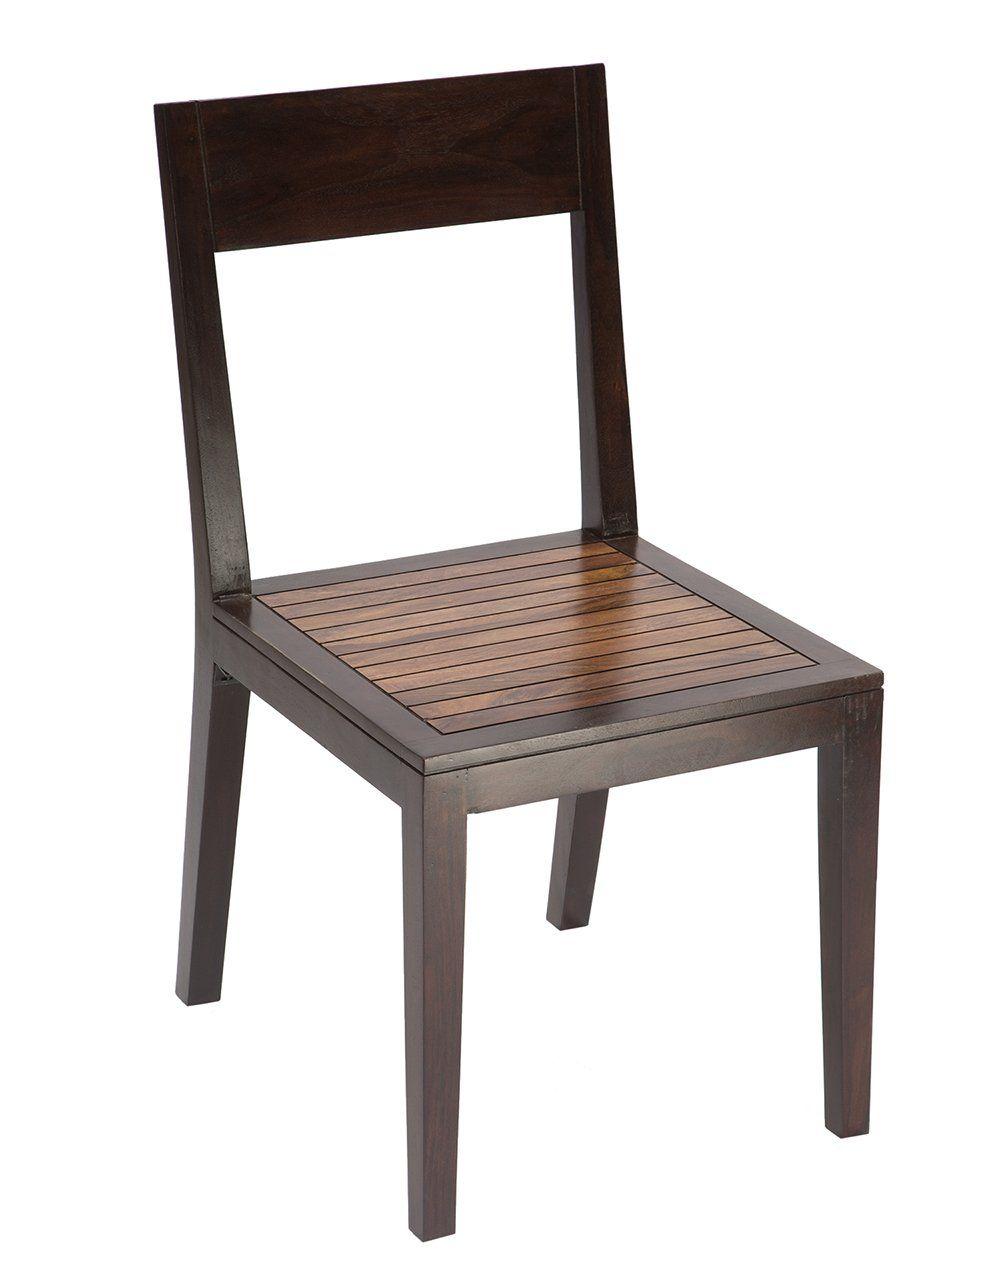 Pin by Reema Priya on mood board   Furniture dining chairs ...